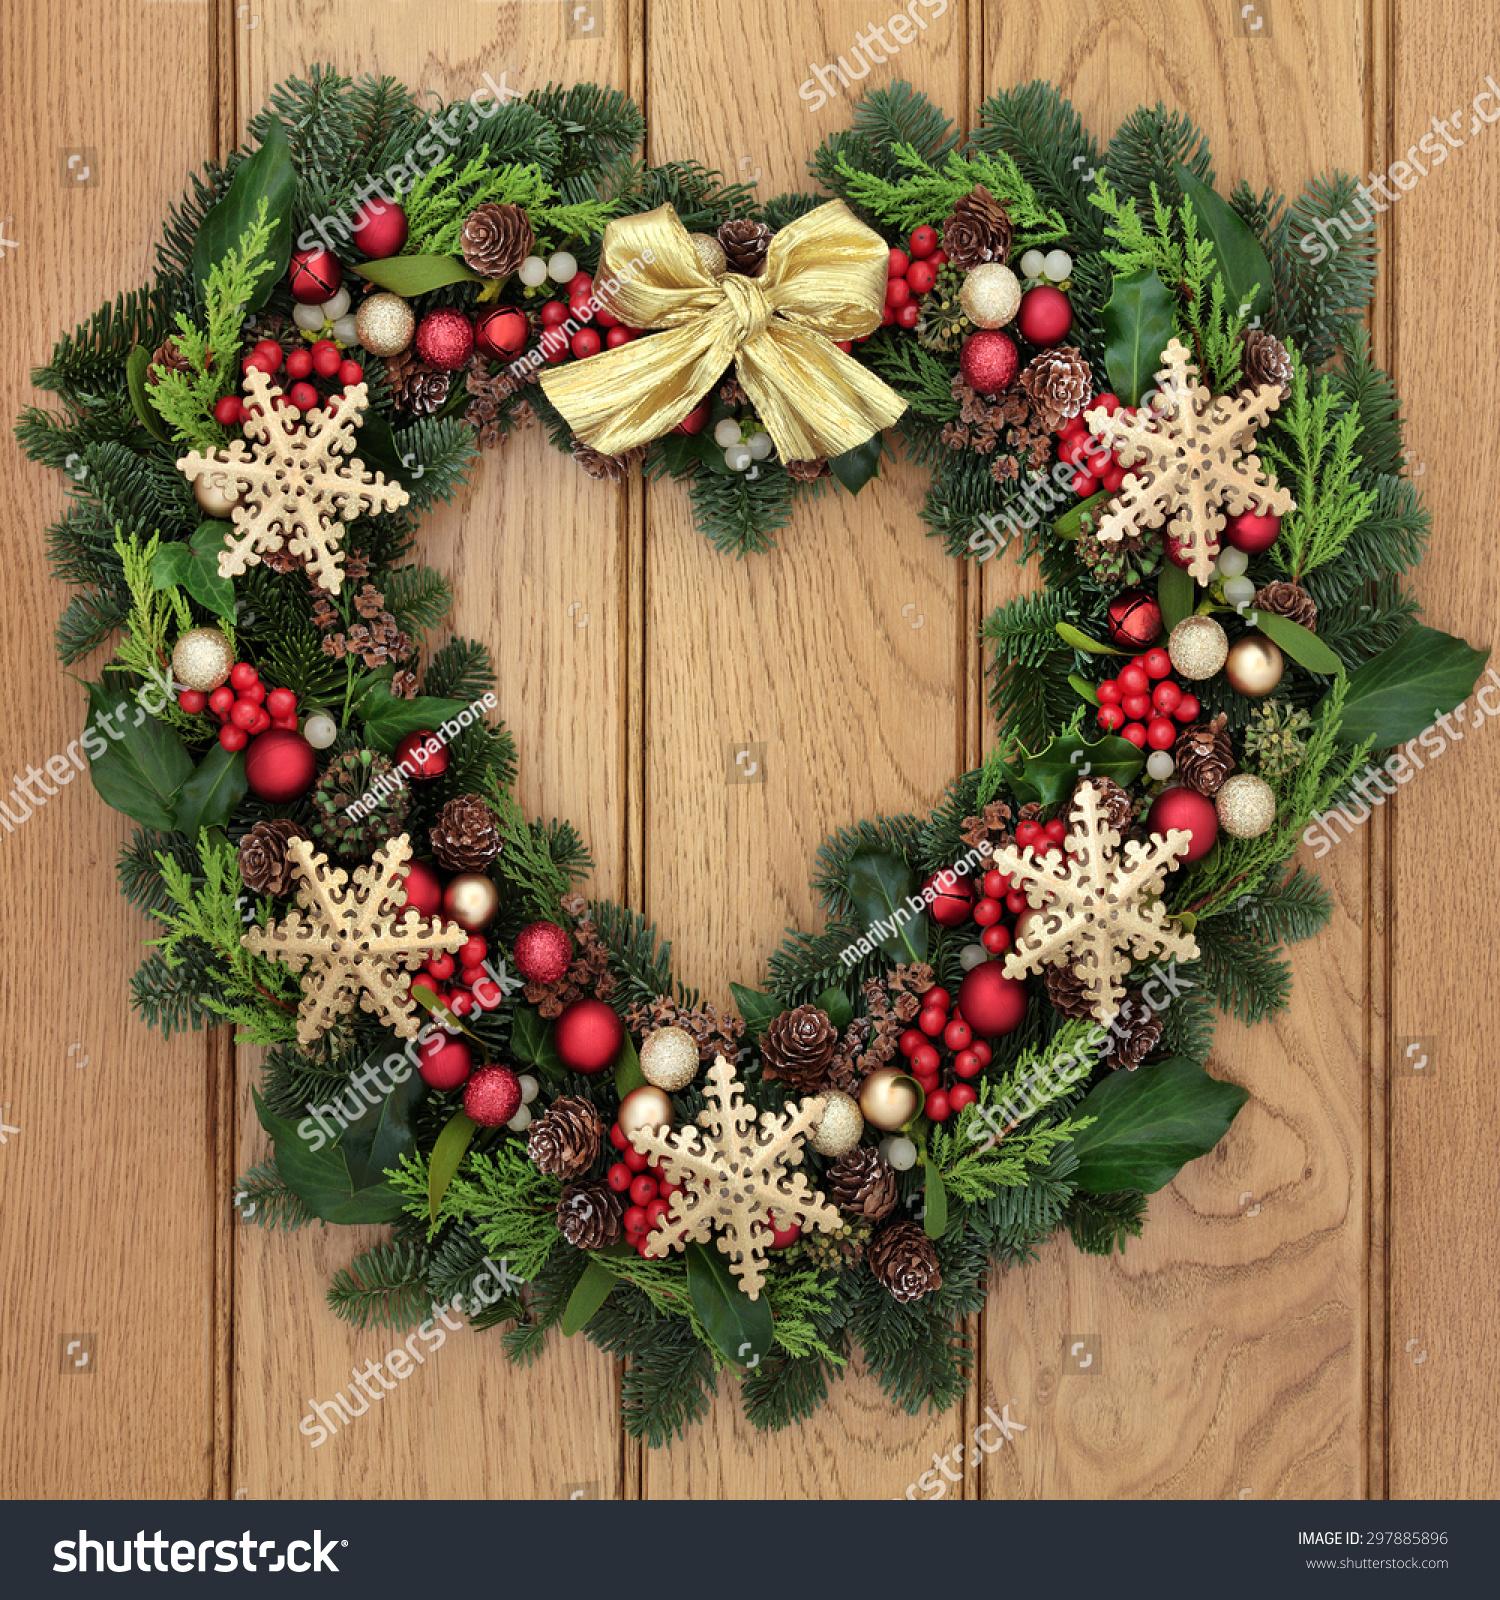 Christmas heart shaped wreath gold snowflake stock photo 297885896 christmas heart shaped wreath with gold snowflake bauble decorations bow holly mistletoe and rubansaba